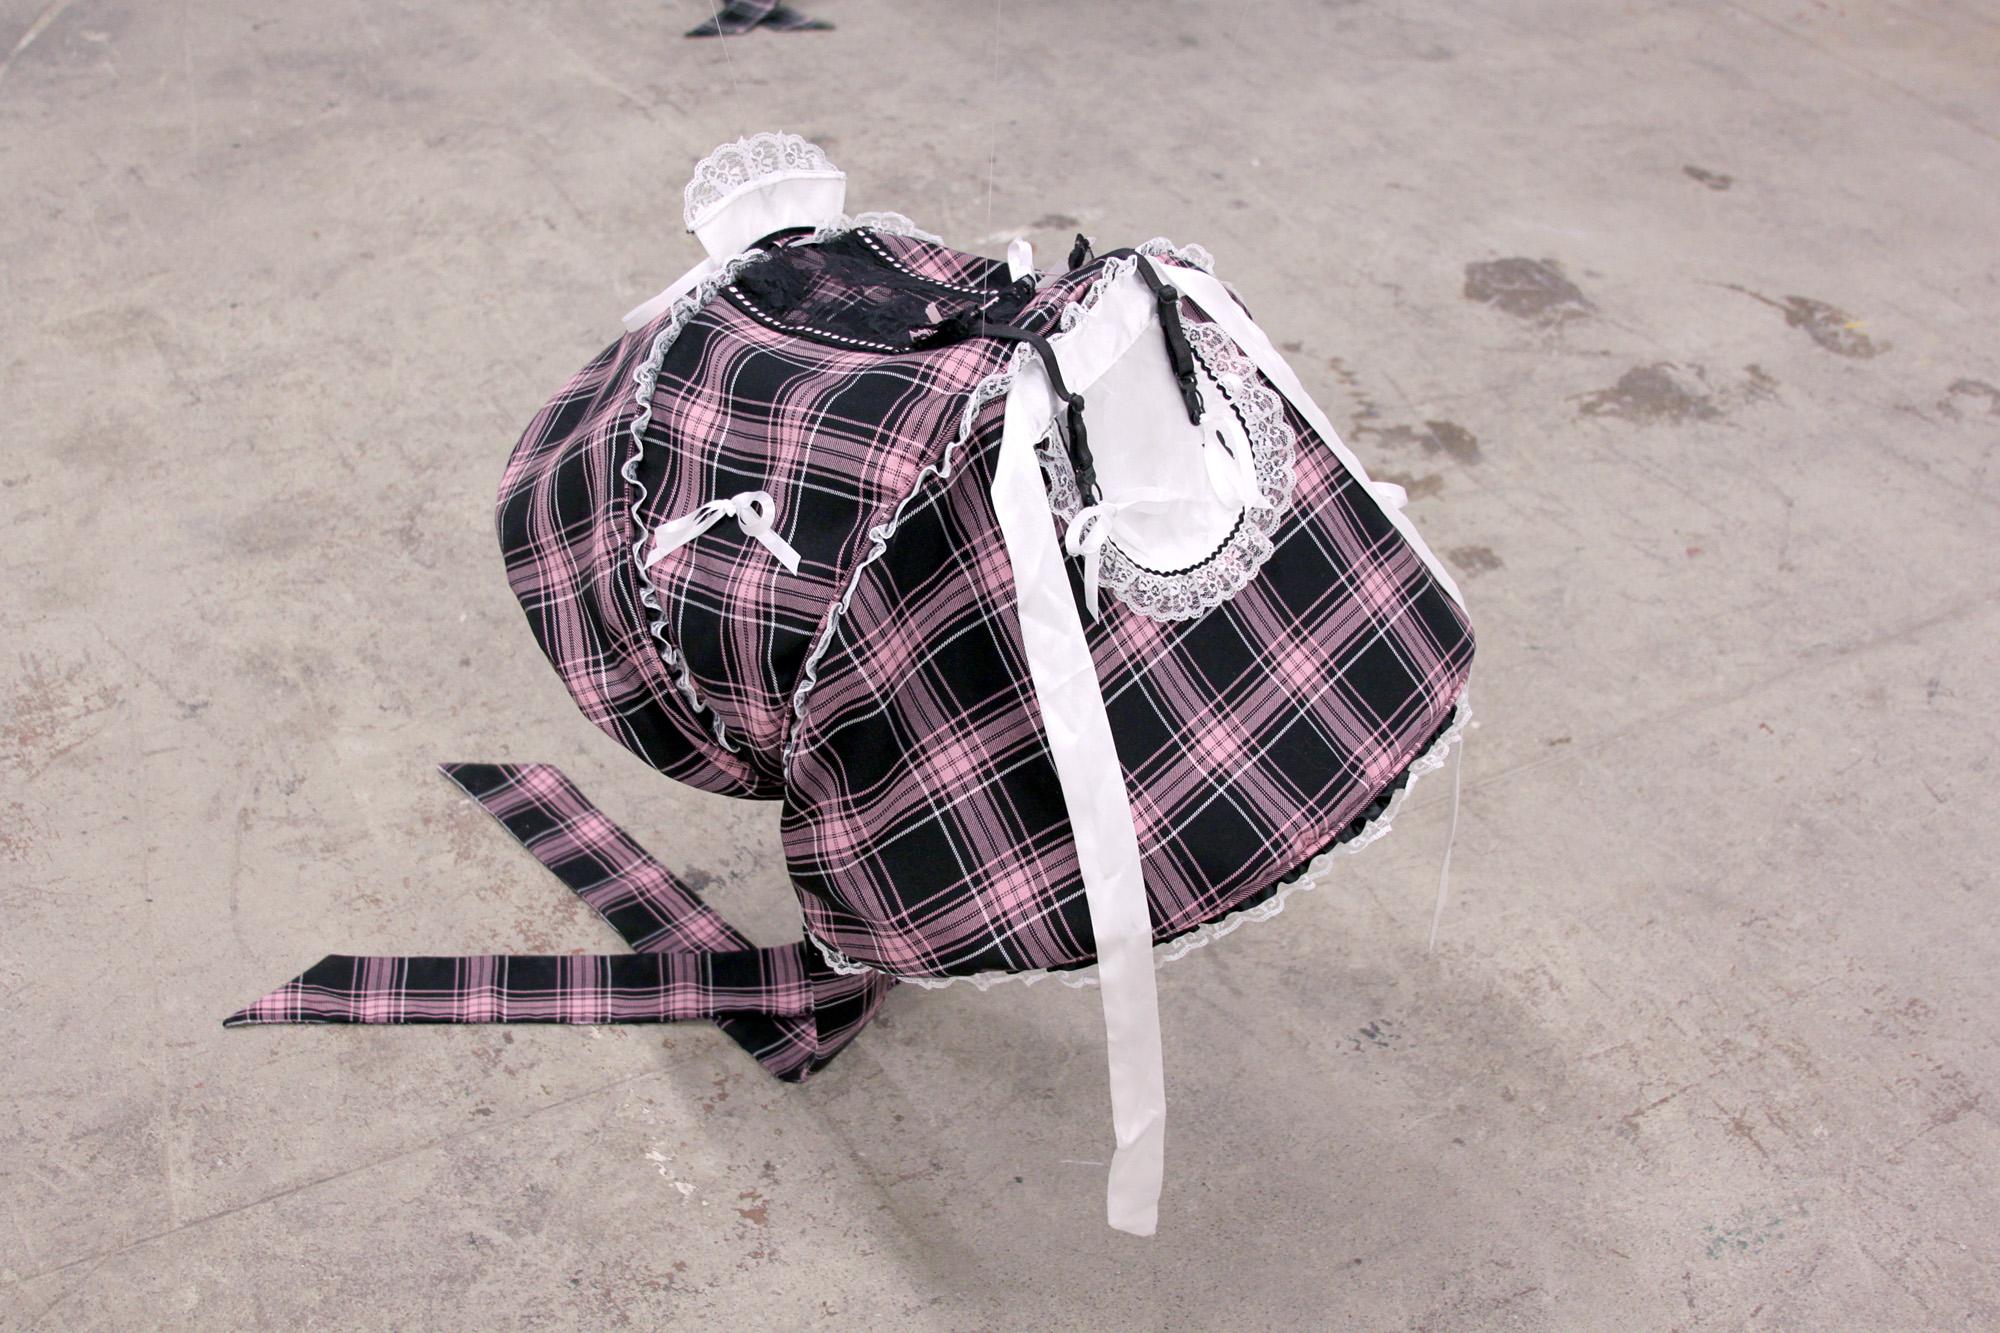 FLANNERY SILVA   Gripper Bon (Maid) , 2016, JJ Cole Broadway Stroller Canopy, Playboy Maid costume, fabric, accessories